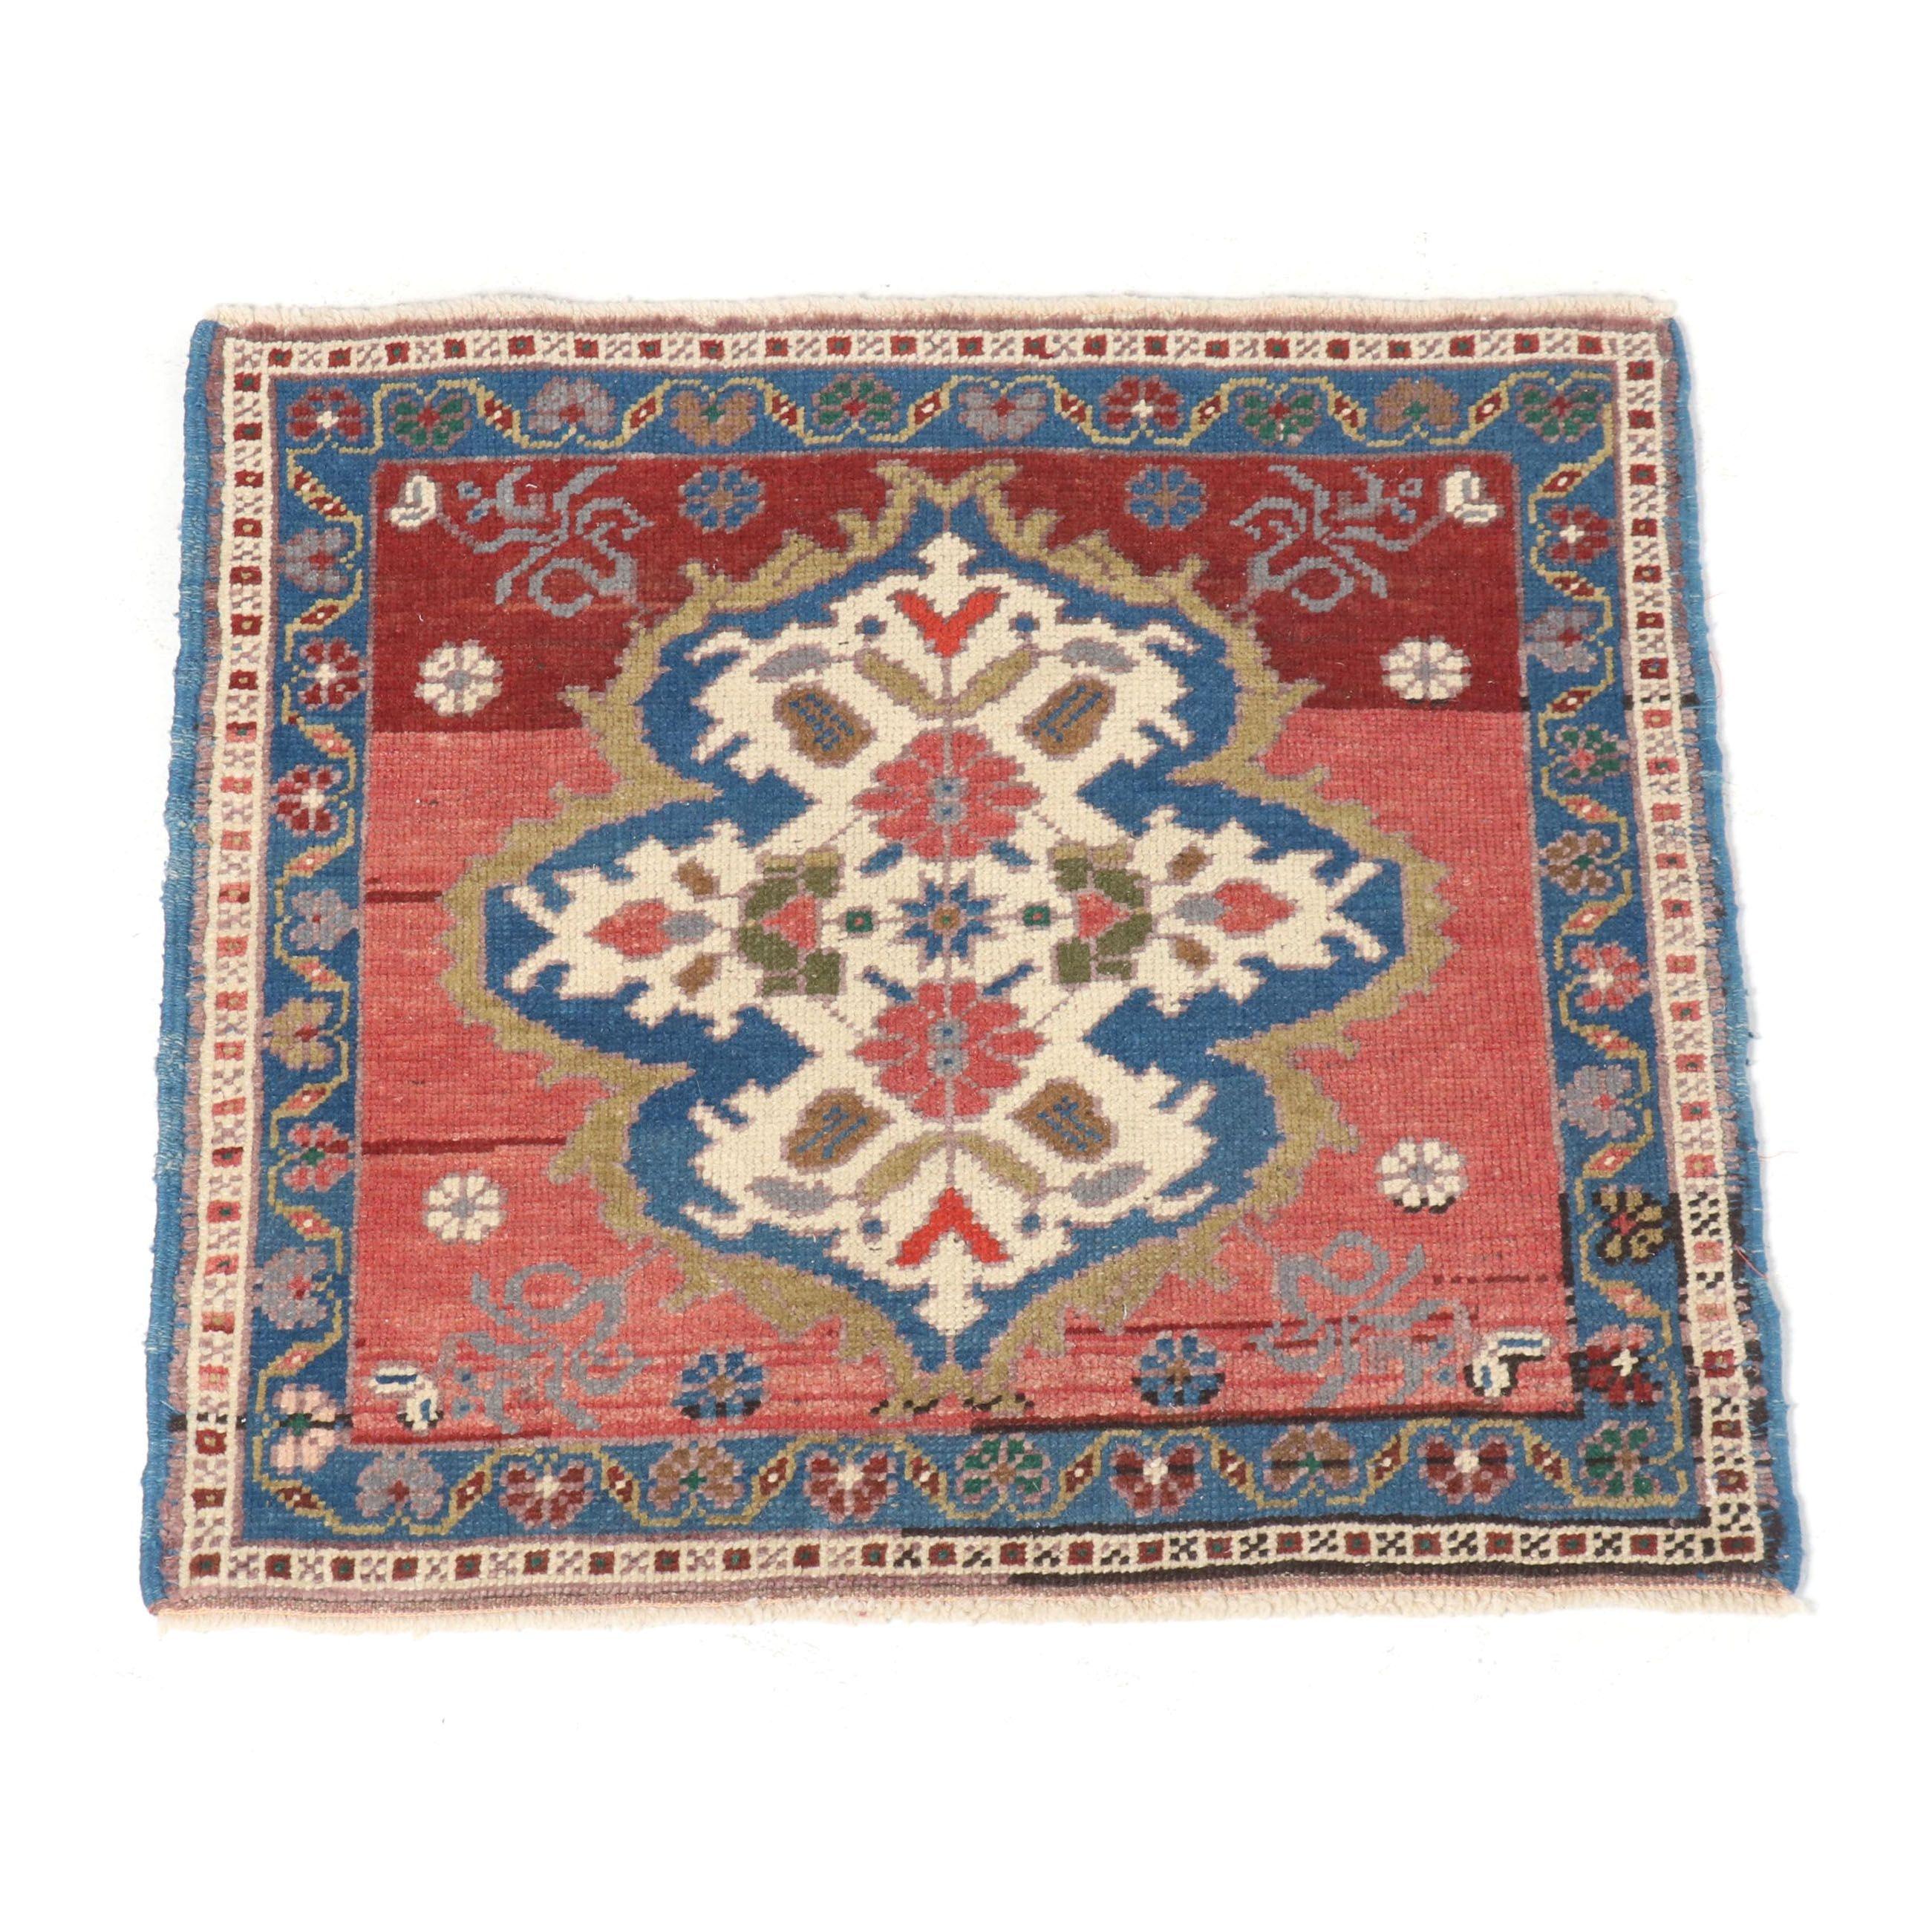 Hand-Knotted Turkish Oushak Wool Floor Mat